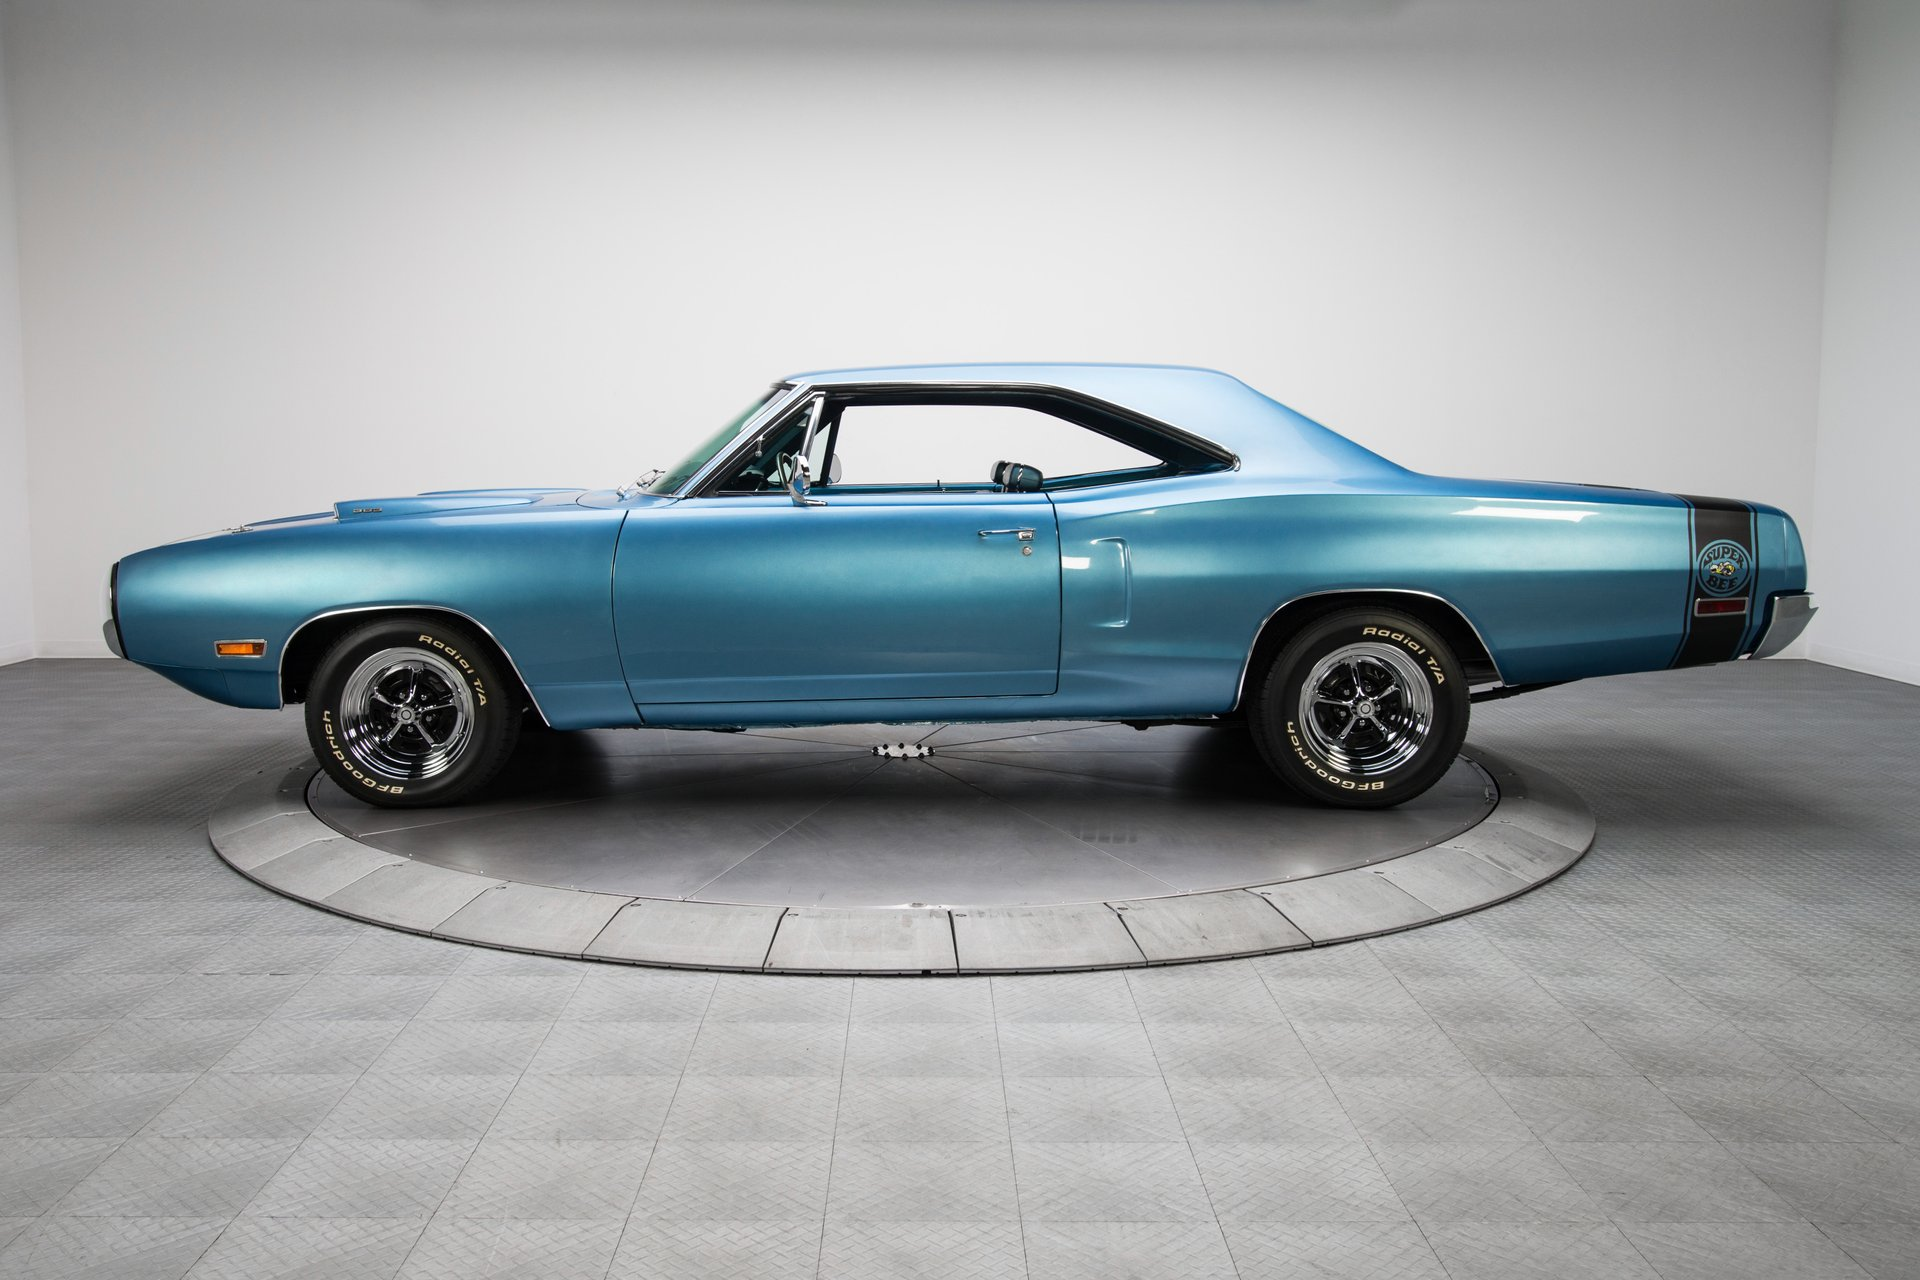 134487 1970 Dodge Coronet RK Motors Classic Cars for Sale